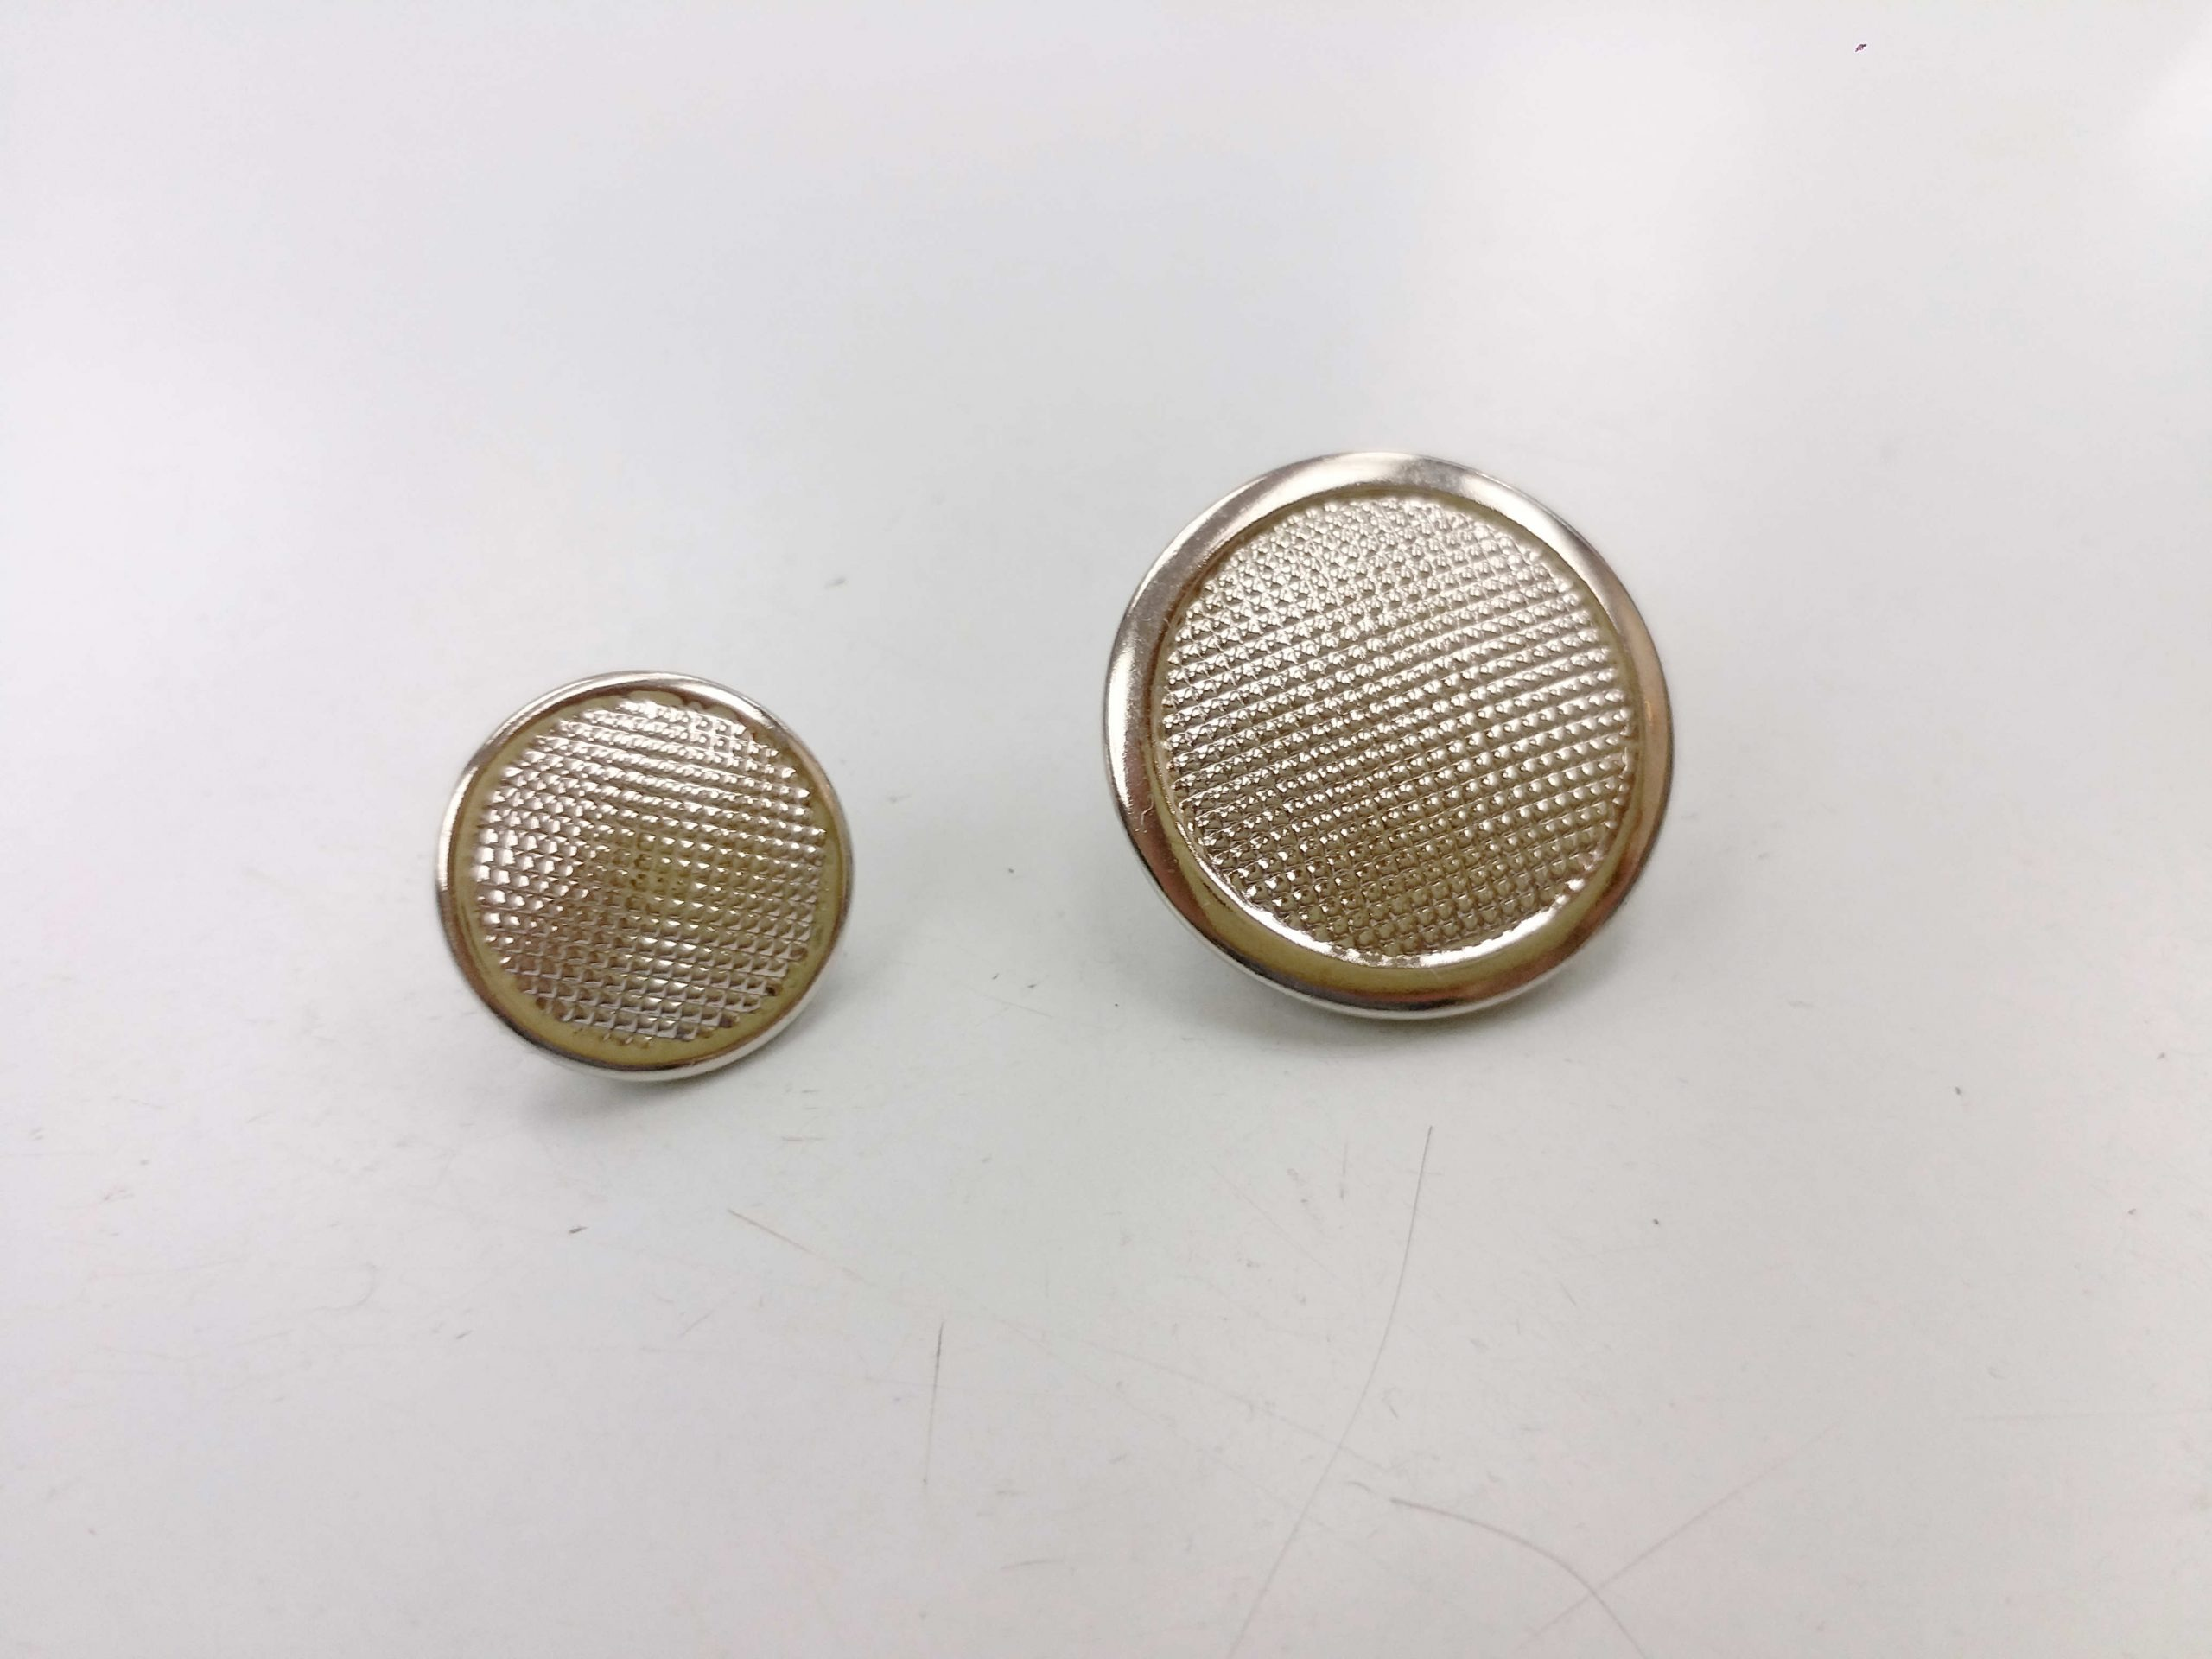 Metal Blazer Buttons - BZ138